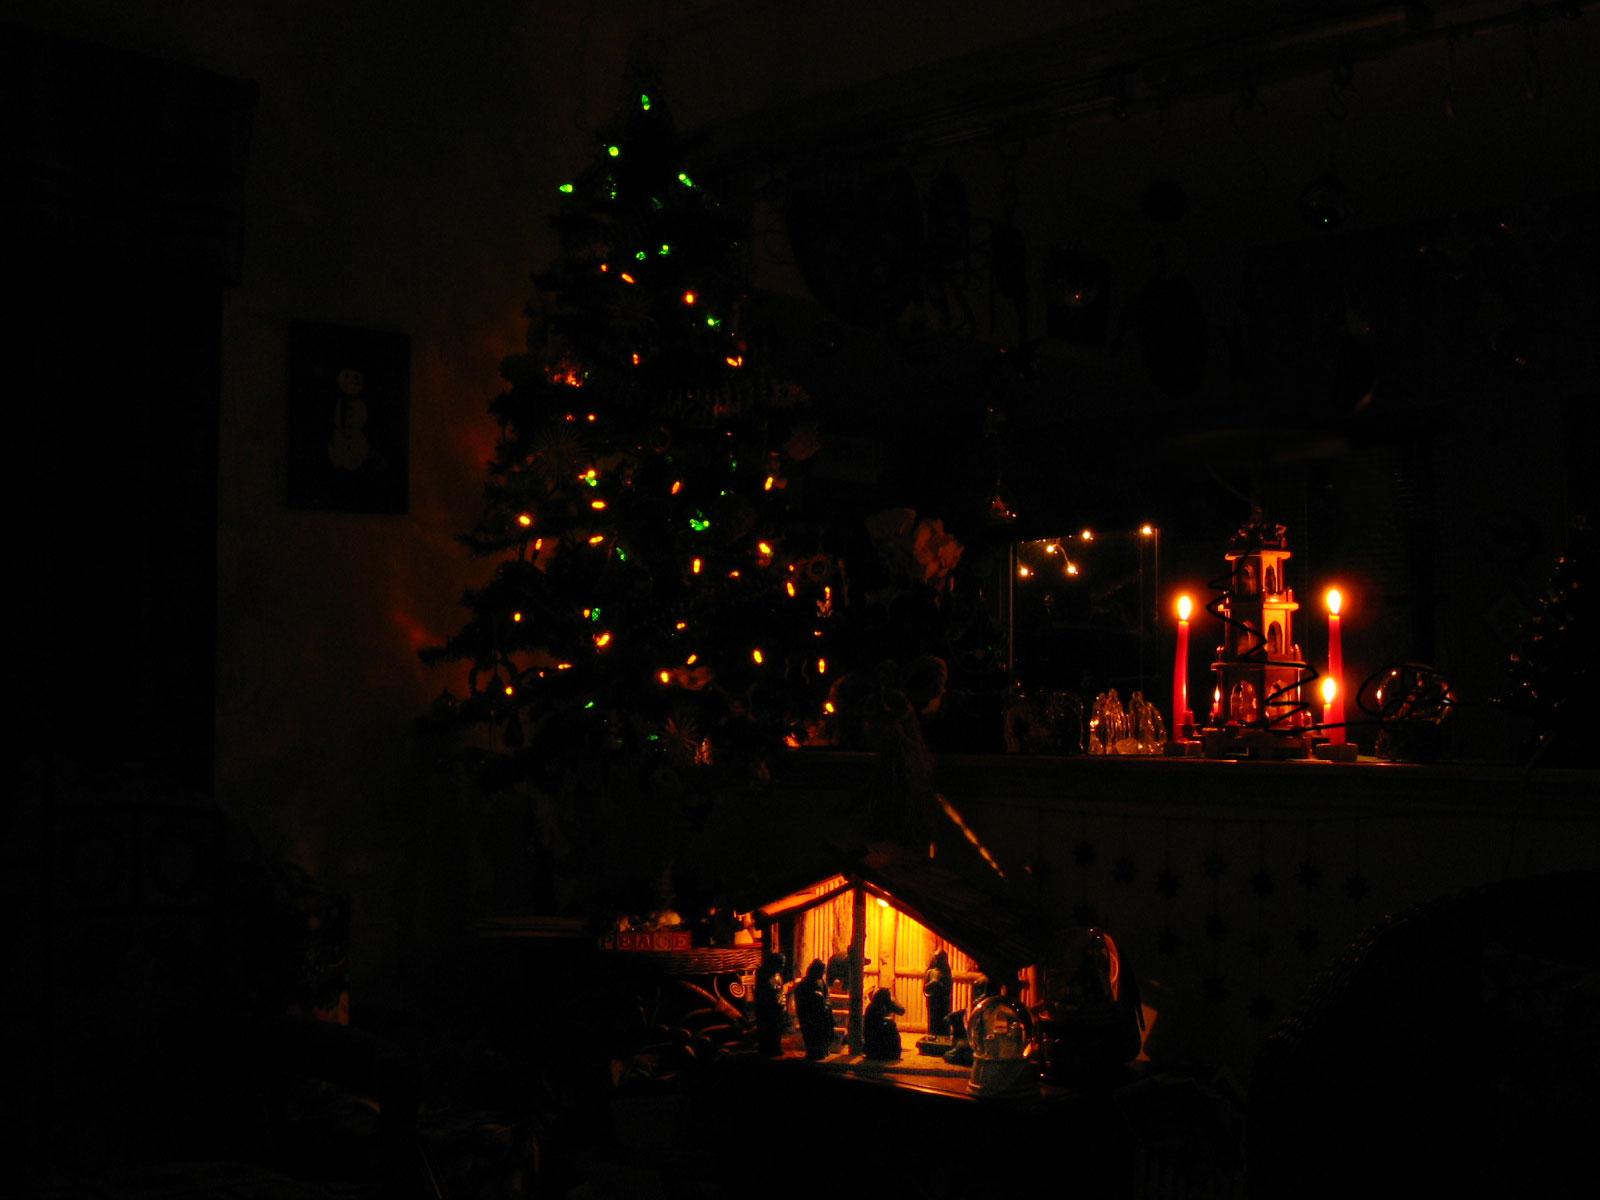 Christmas tree, Nativity, and candles at Christmas